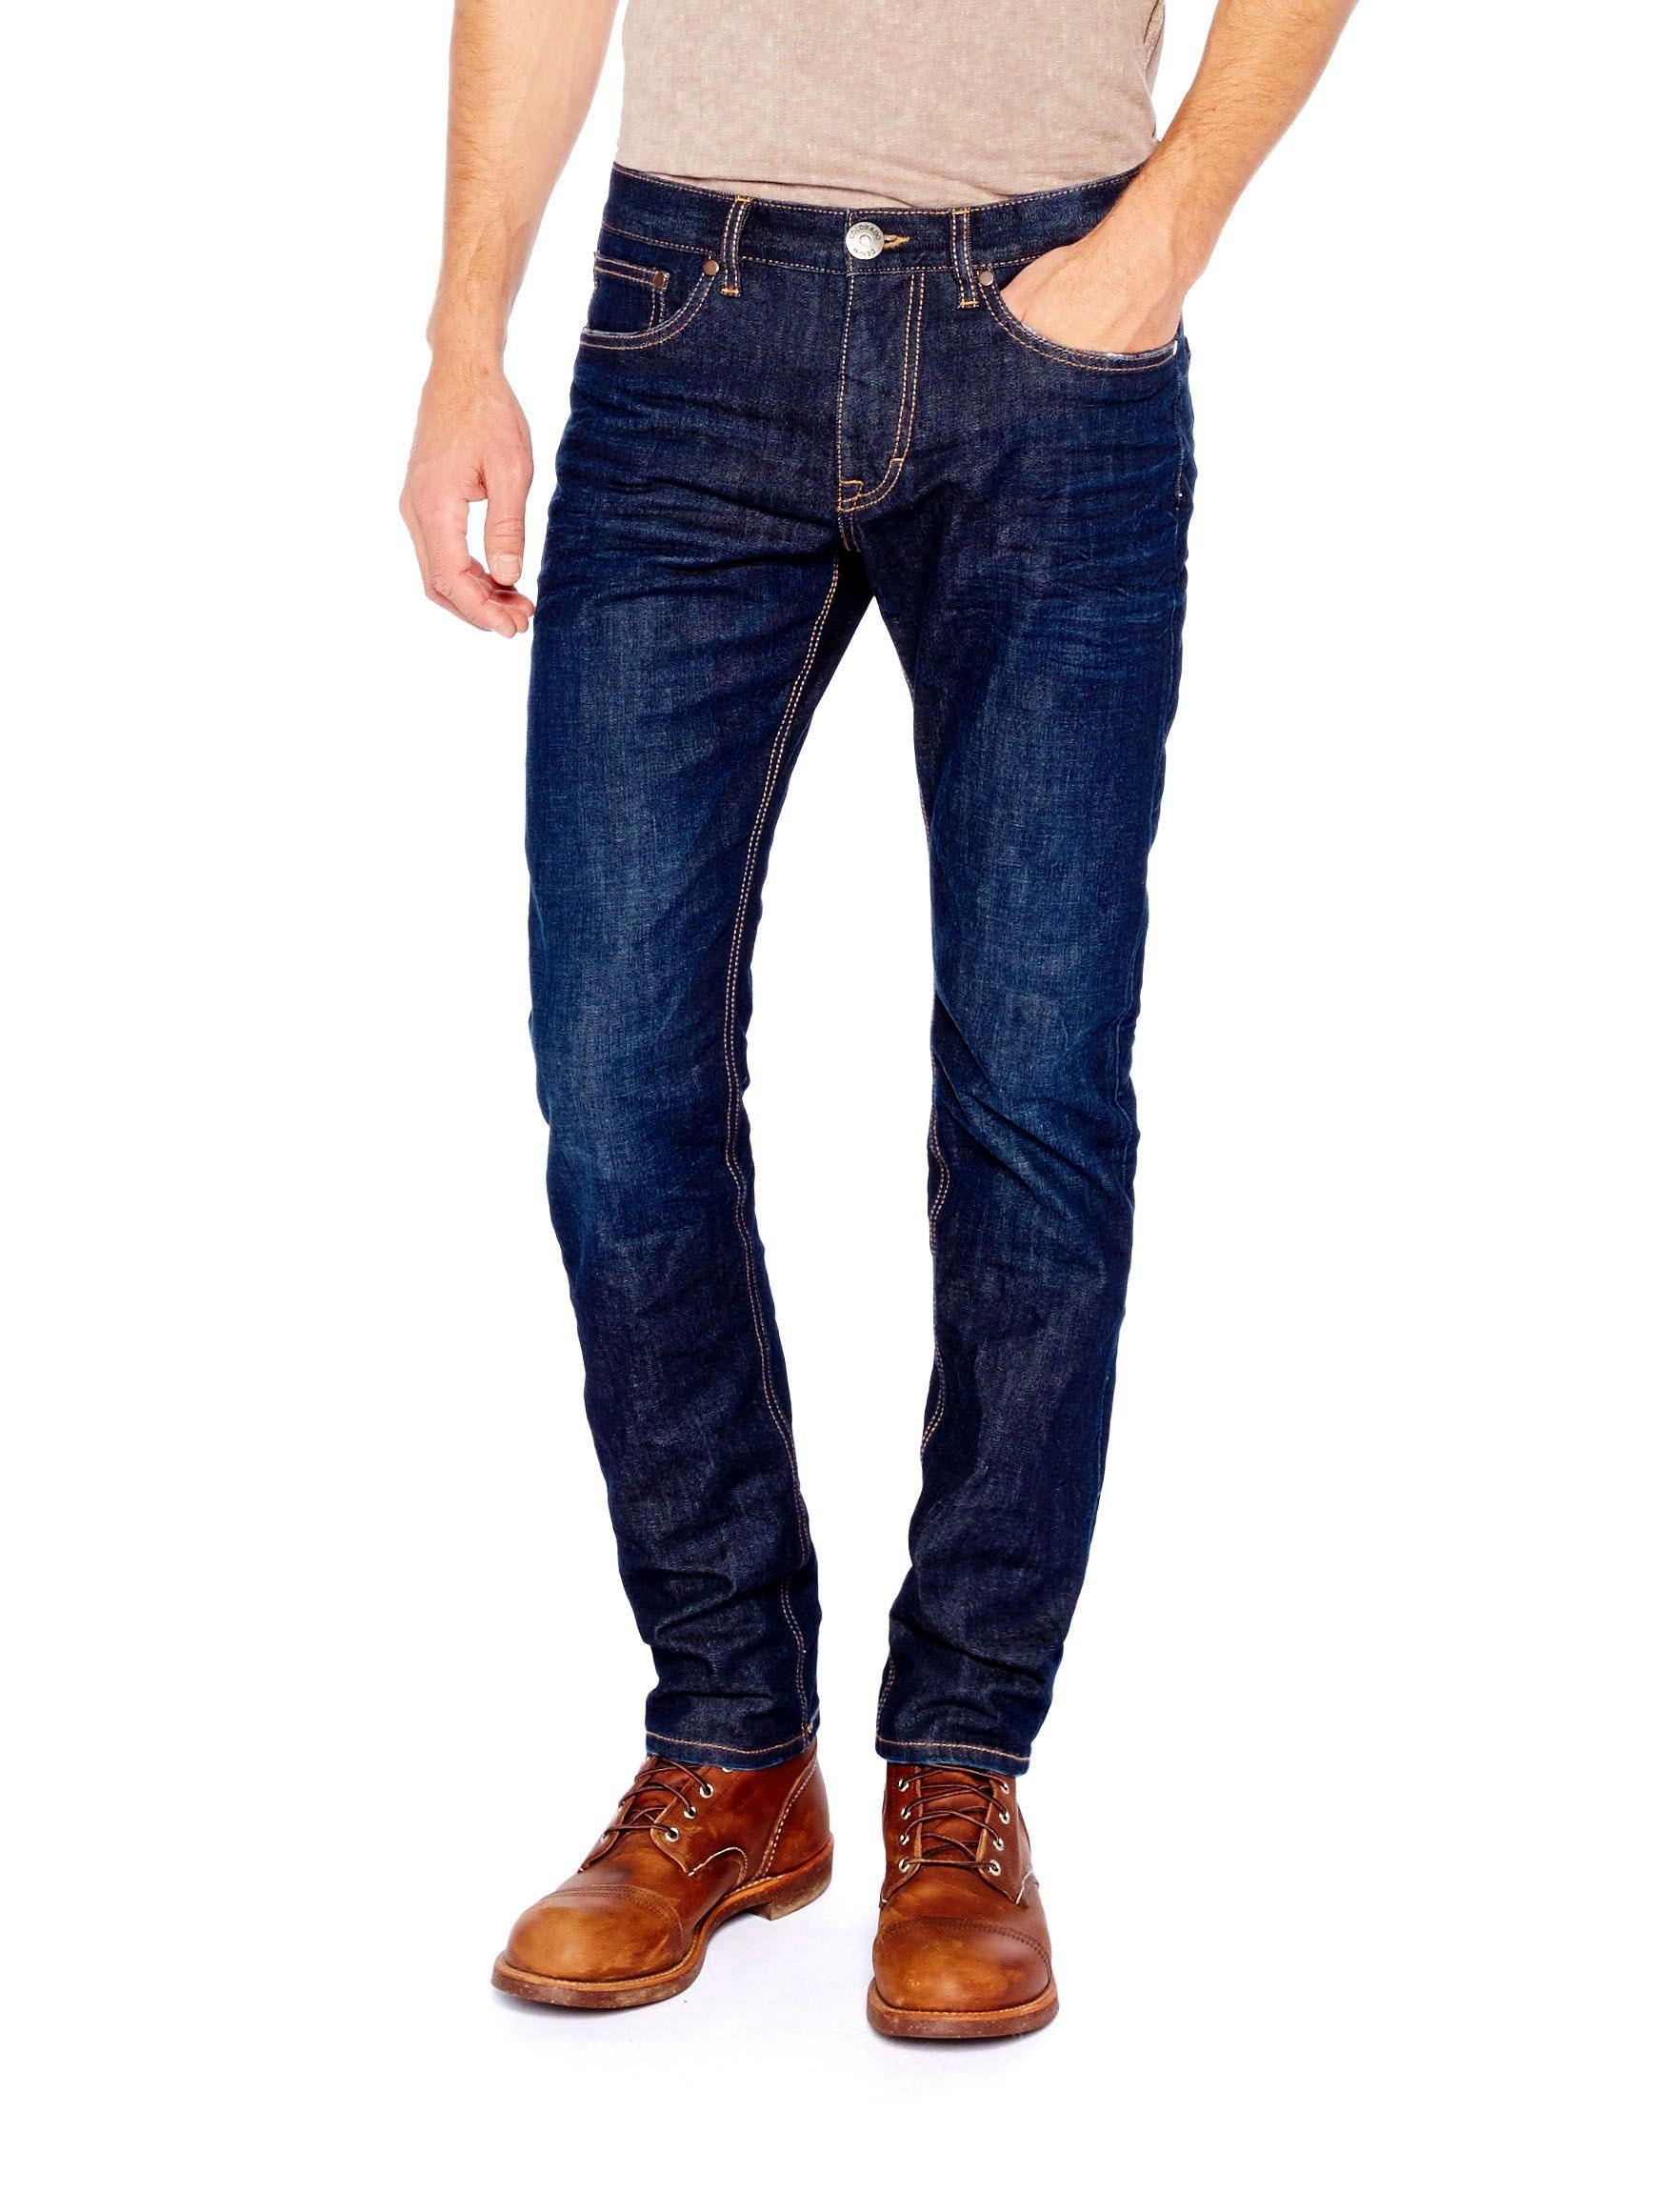 Revils Jeans 305 dark blue Stretch